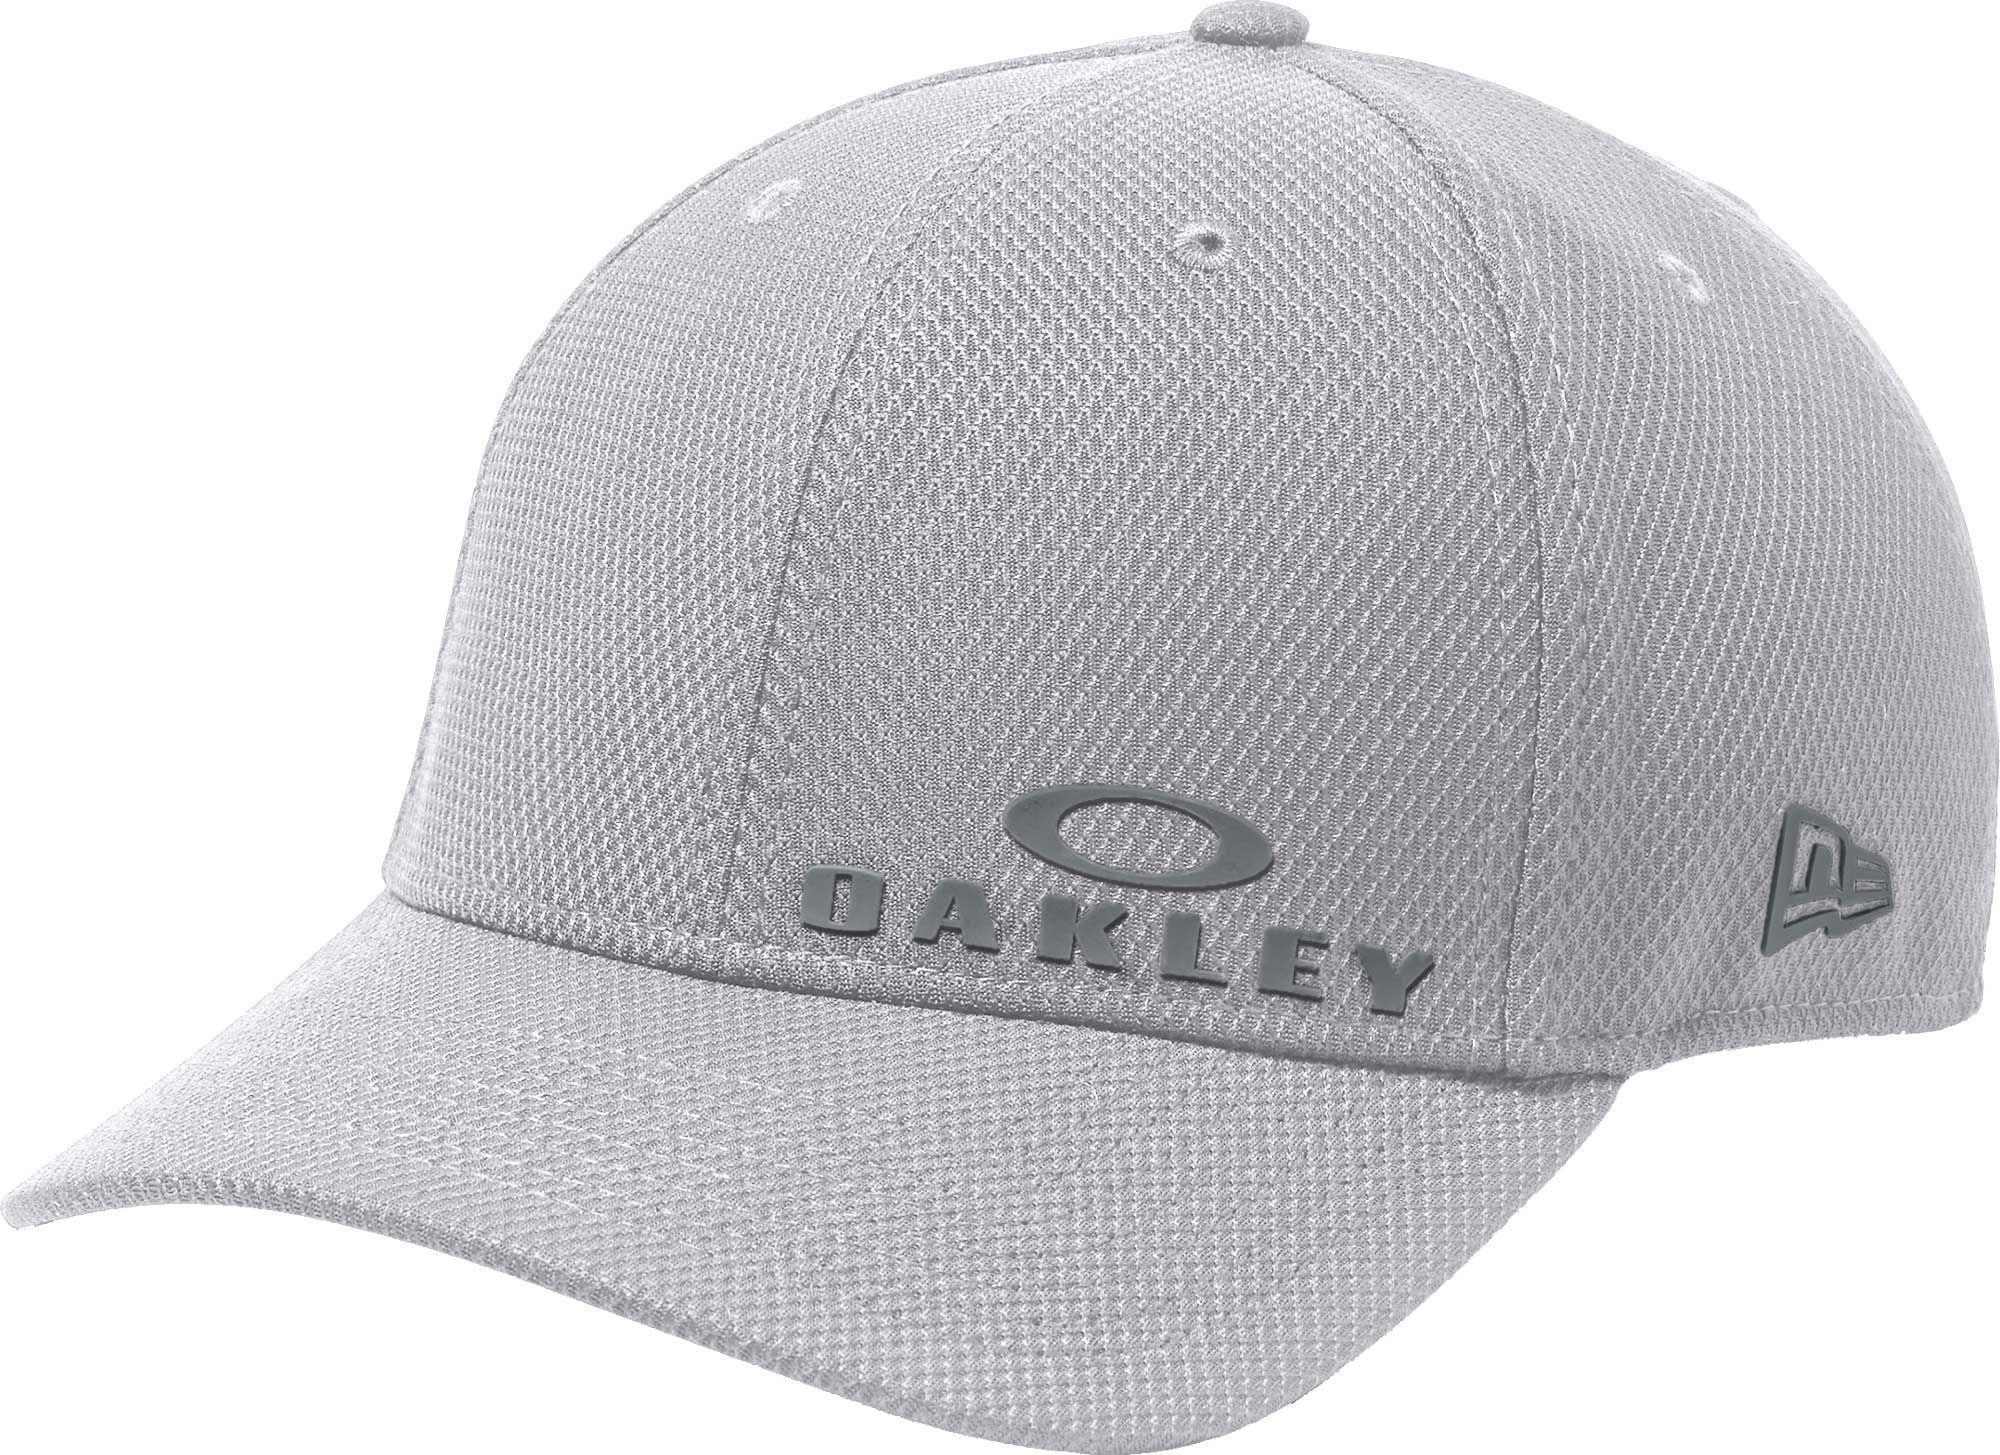 365e49dbd40 Lyst - Oakley Diamond New Era Golf Hat in Gray for Men